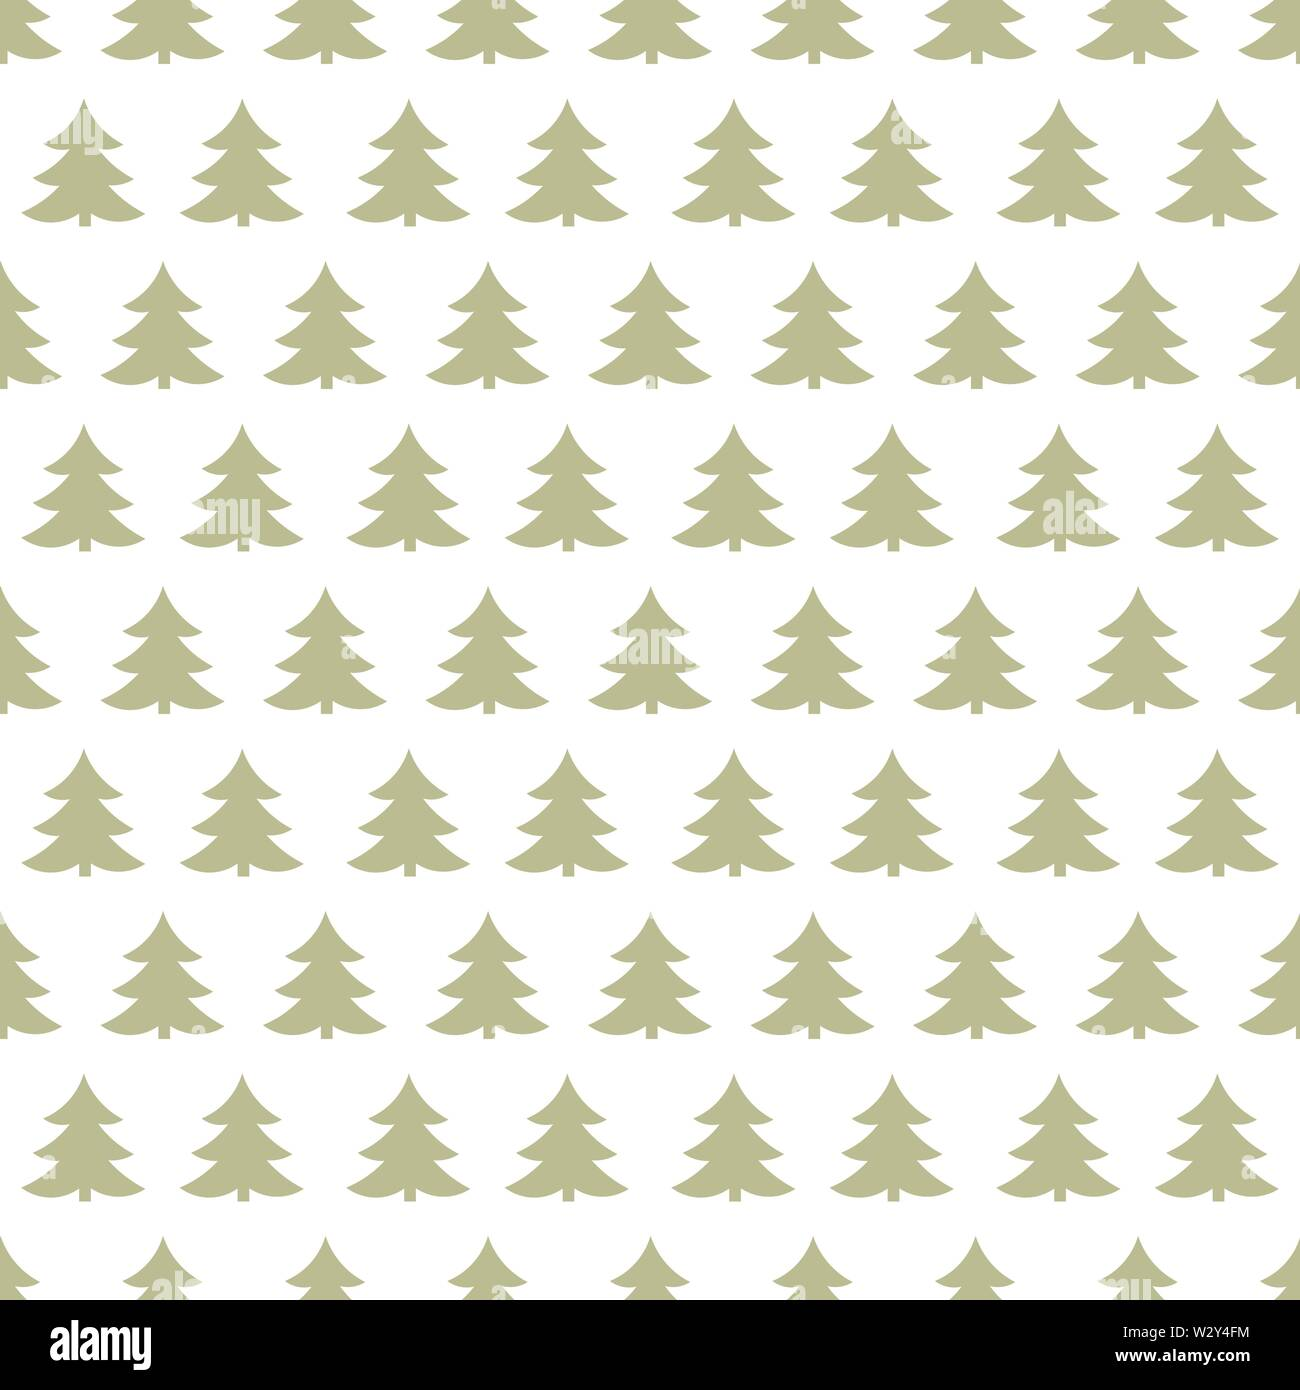 Christmas trees pattern on white background. Vector illustration - Stock Image